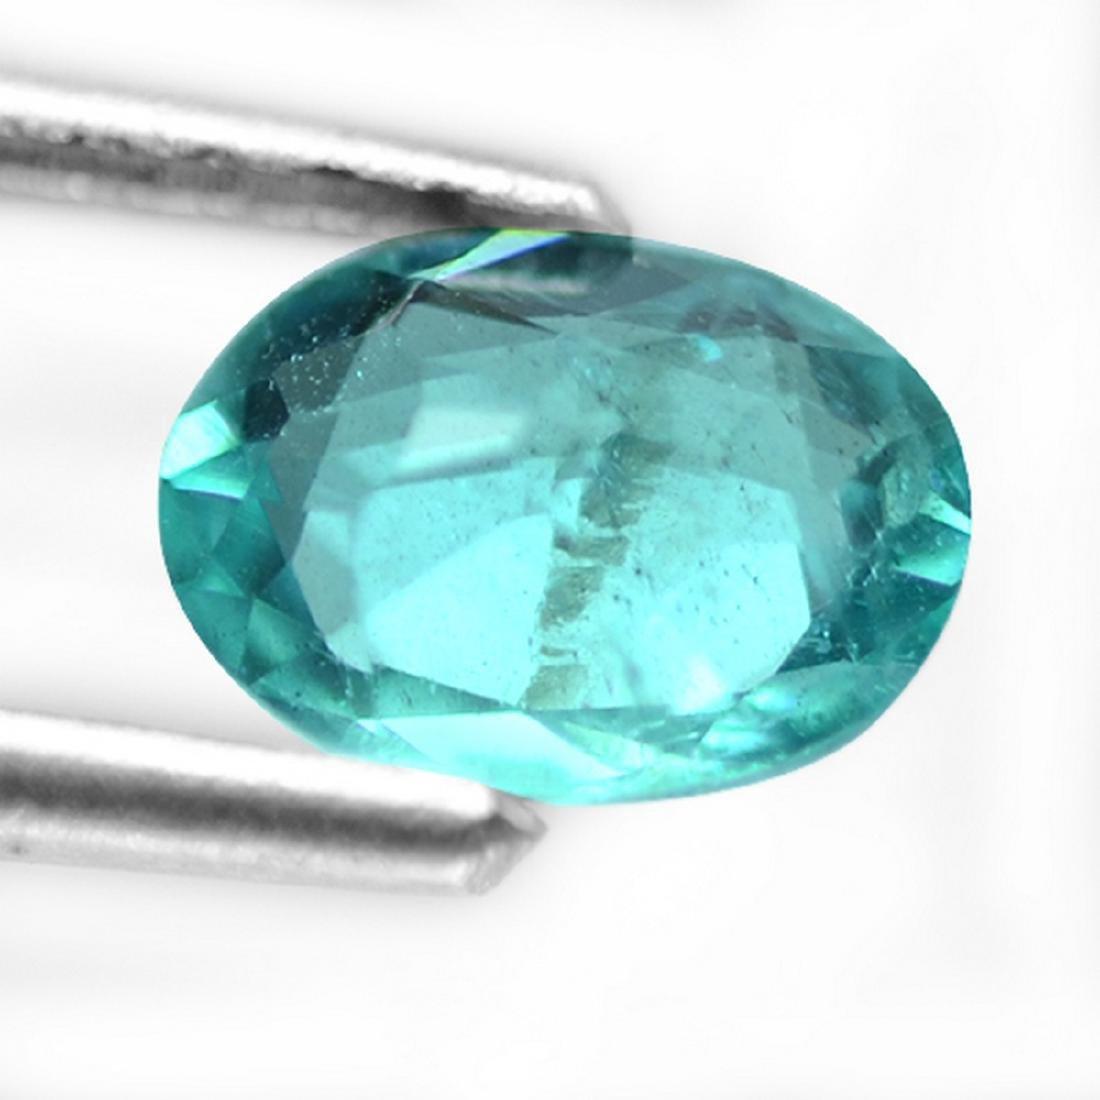 1.02 Carat Loose Natural Paraiba Blue Apatite Oval - 2